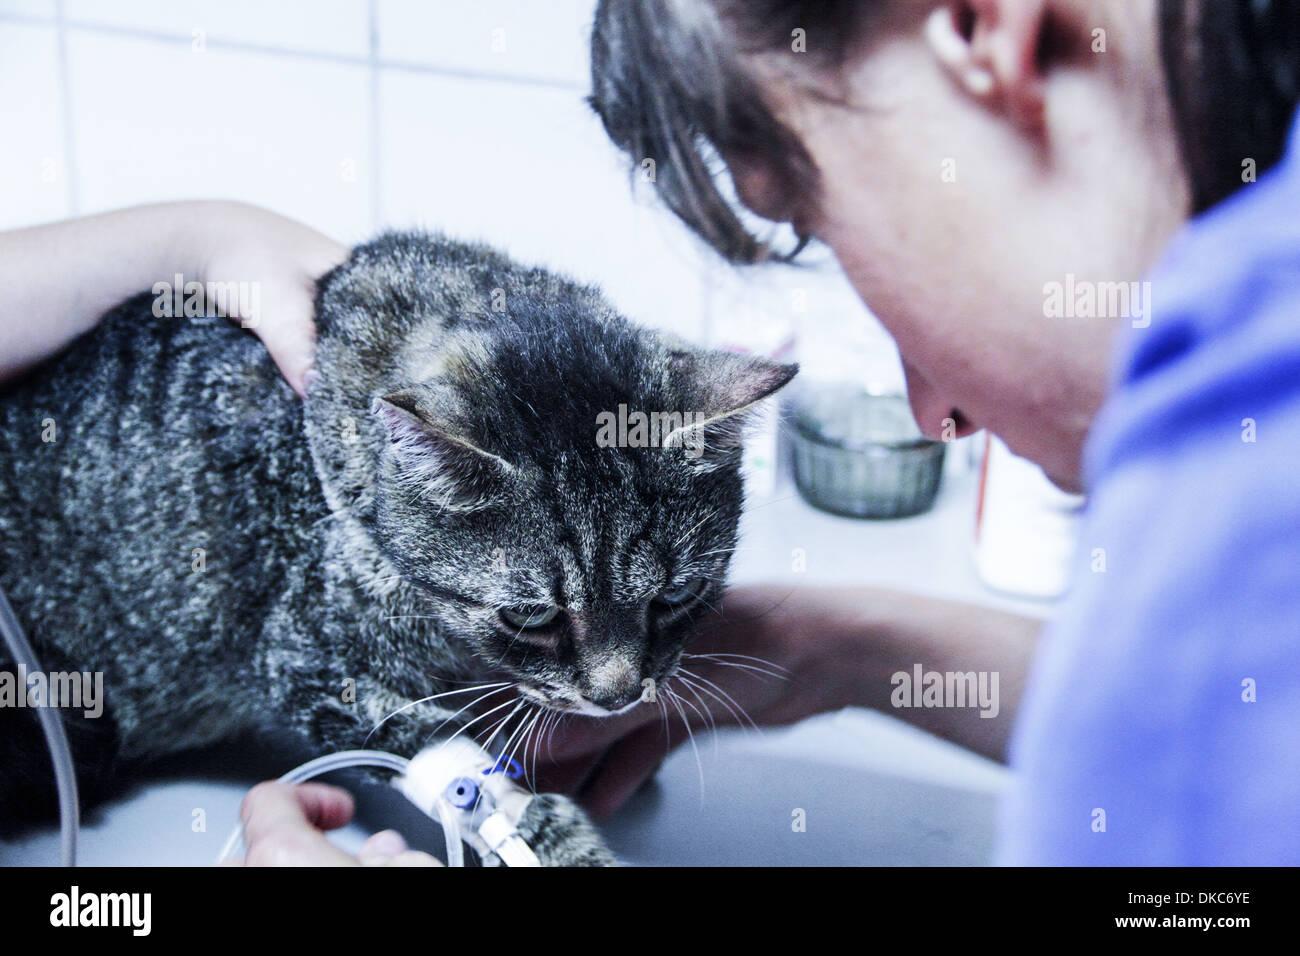 Vet treating domestic cat - Stock Image